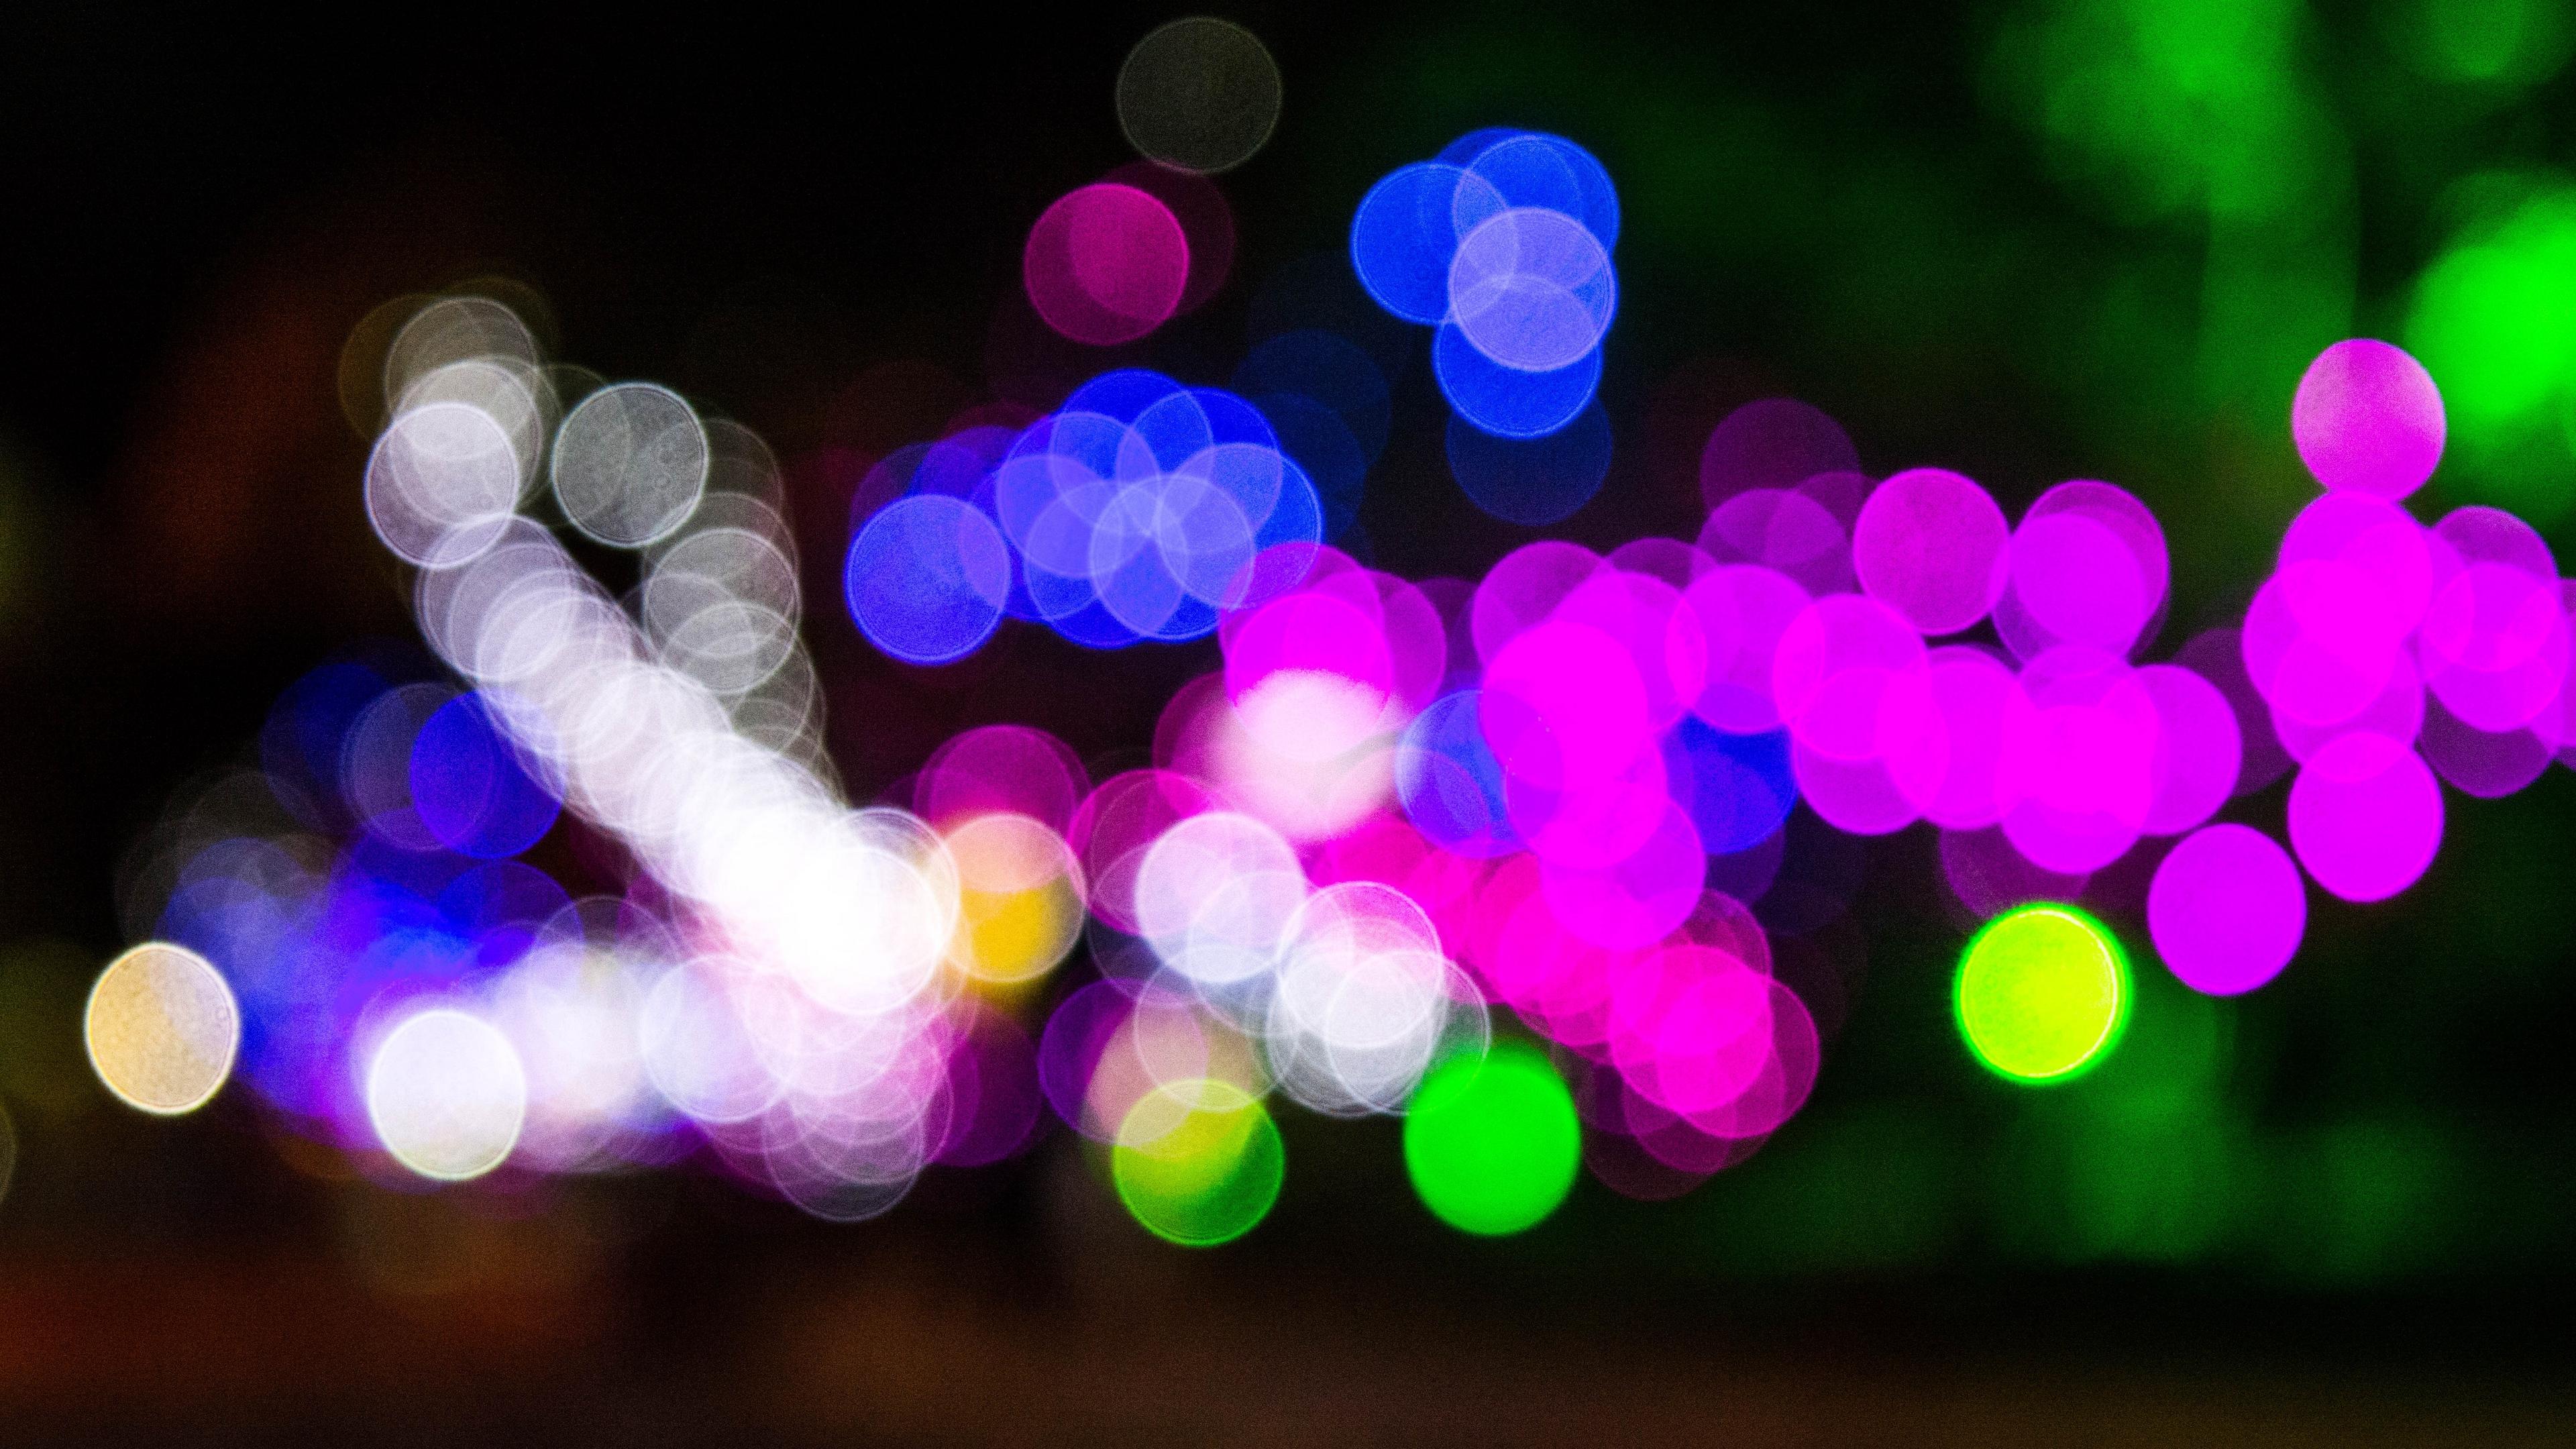 glare circles bright colorful 4k 1539369536 - glare, circles, bright, colorful 4k - glare, Circles, Bright